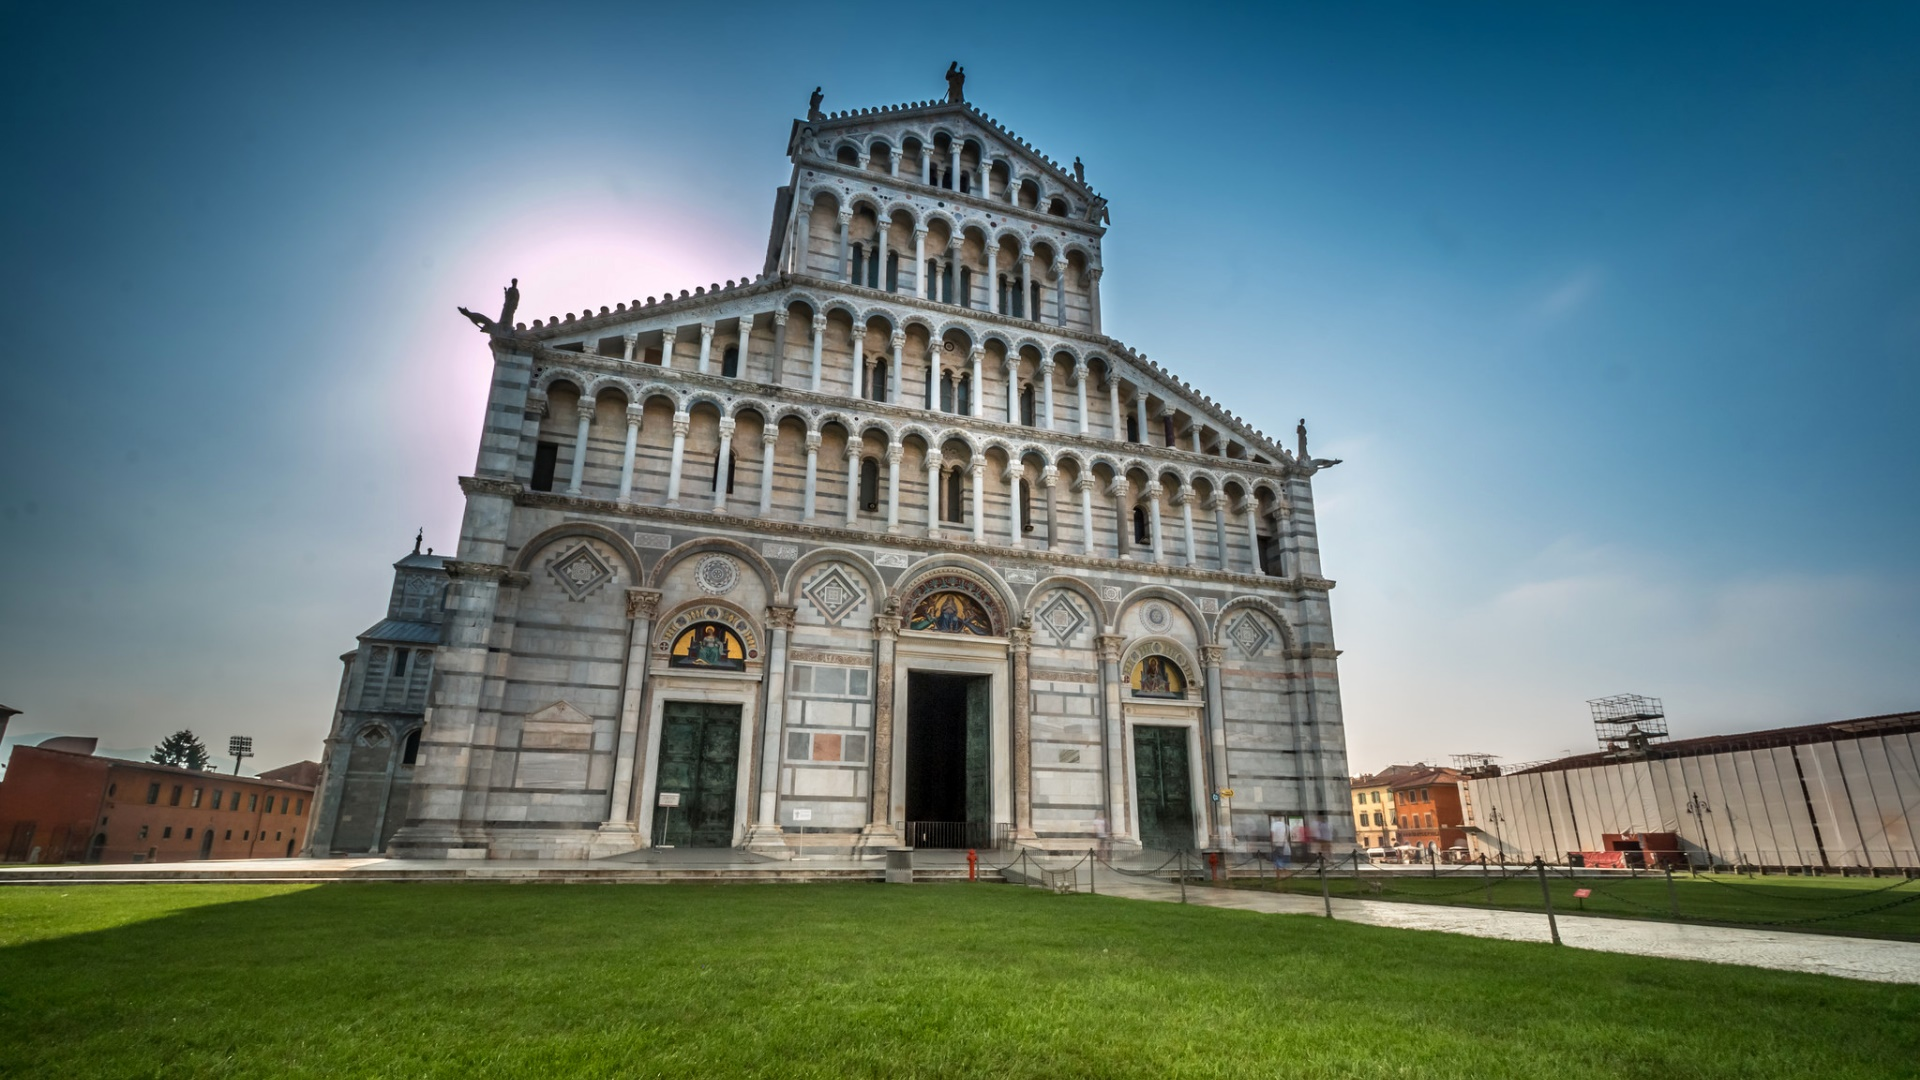 Cattedrale di Pisa wallpaper